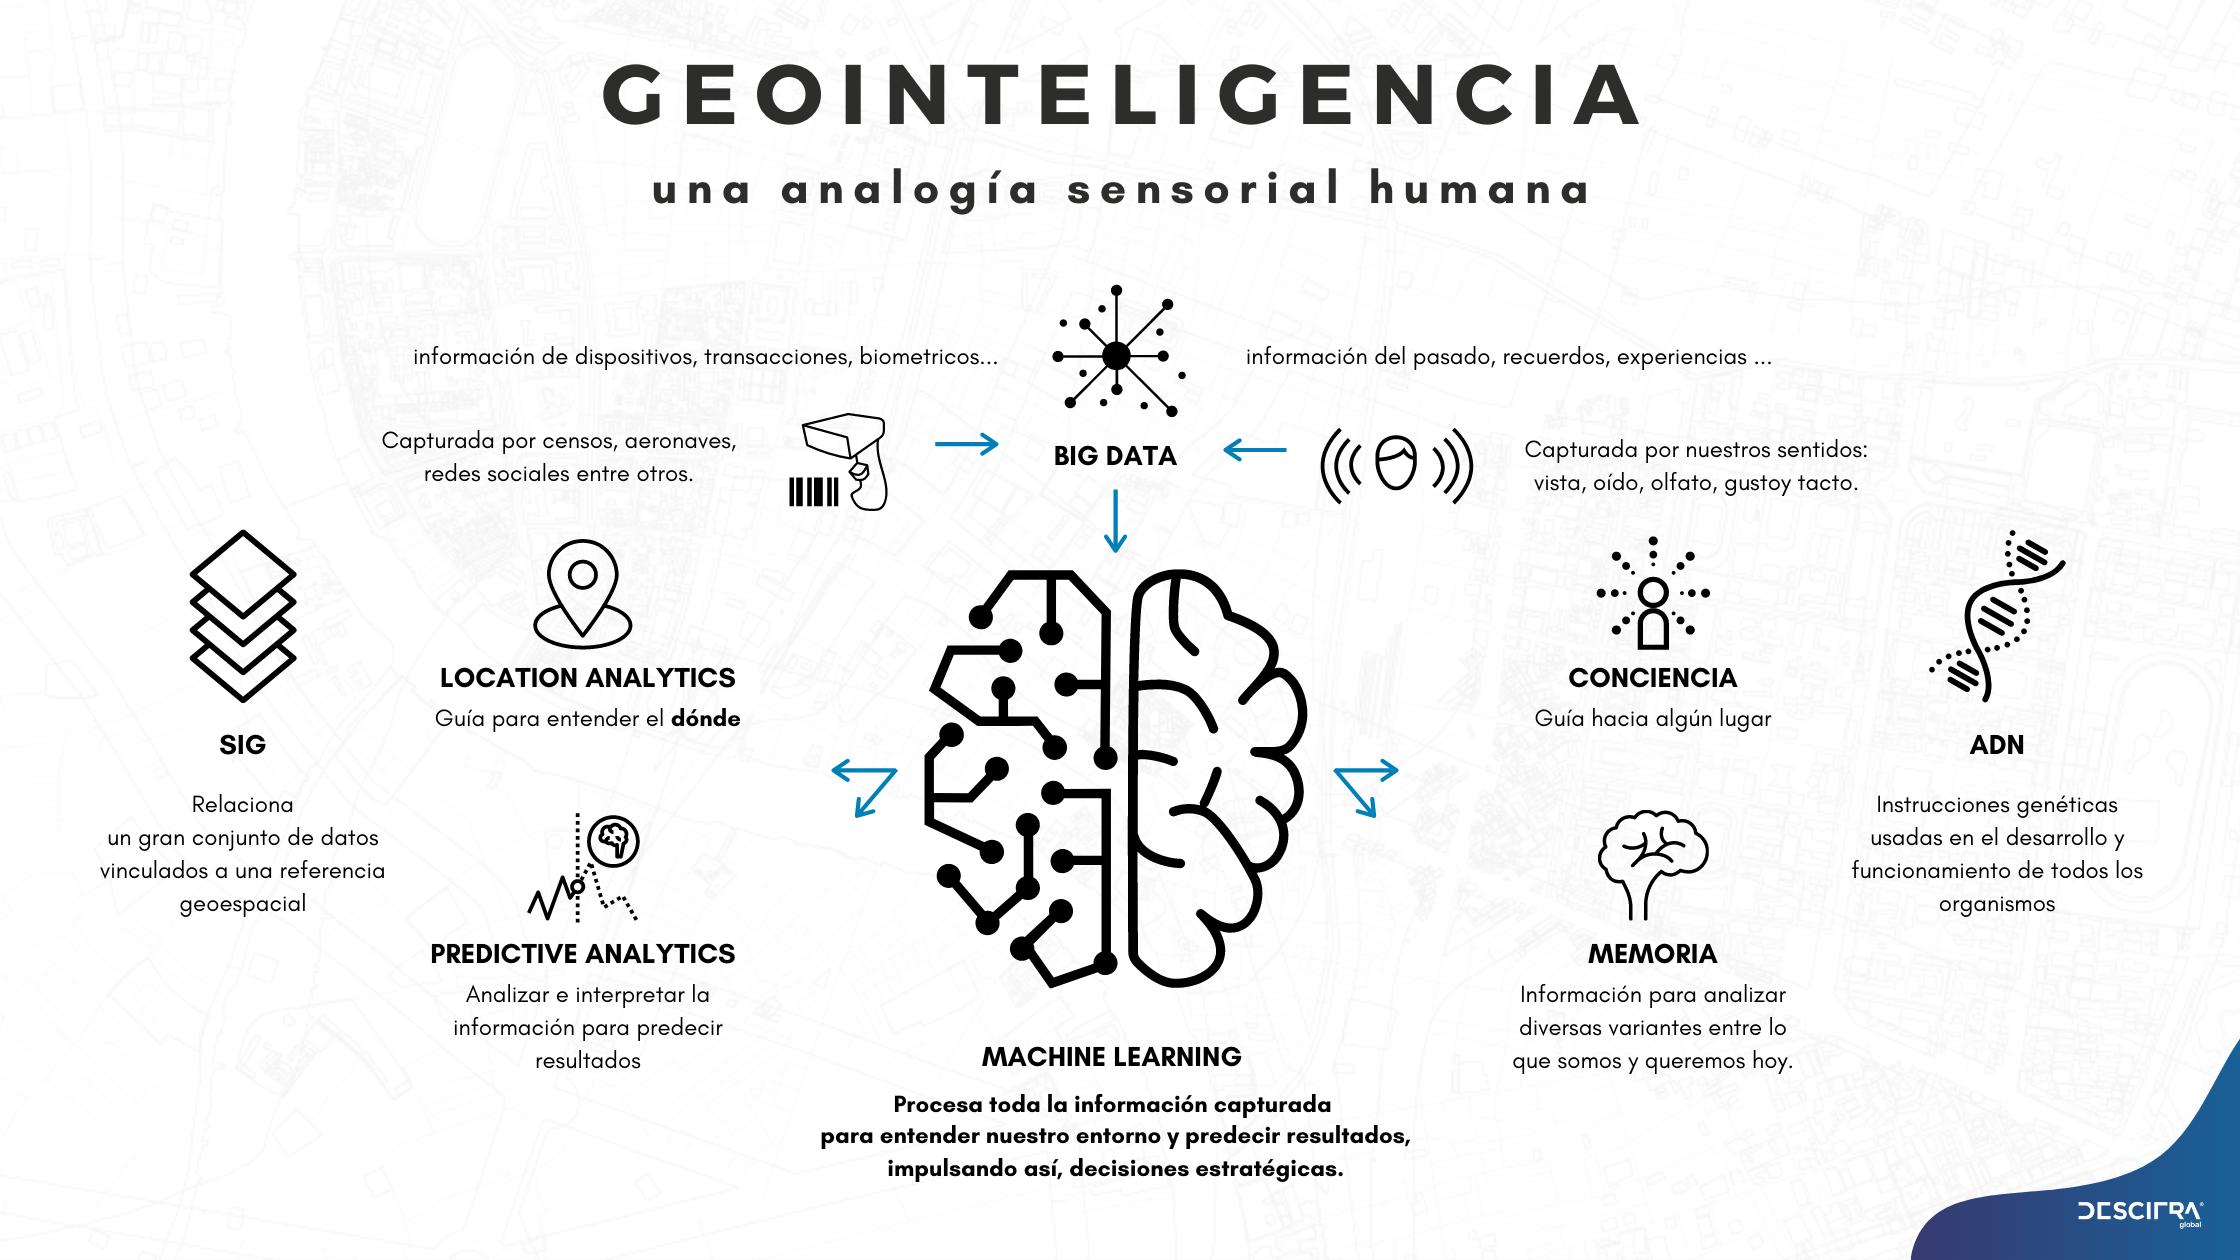 Analogía sensorial humana